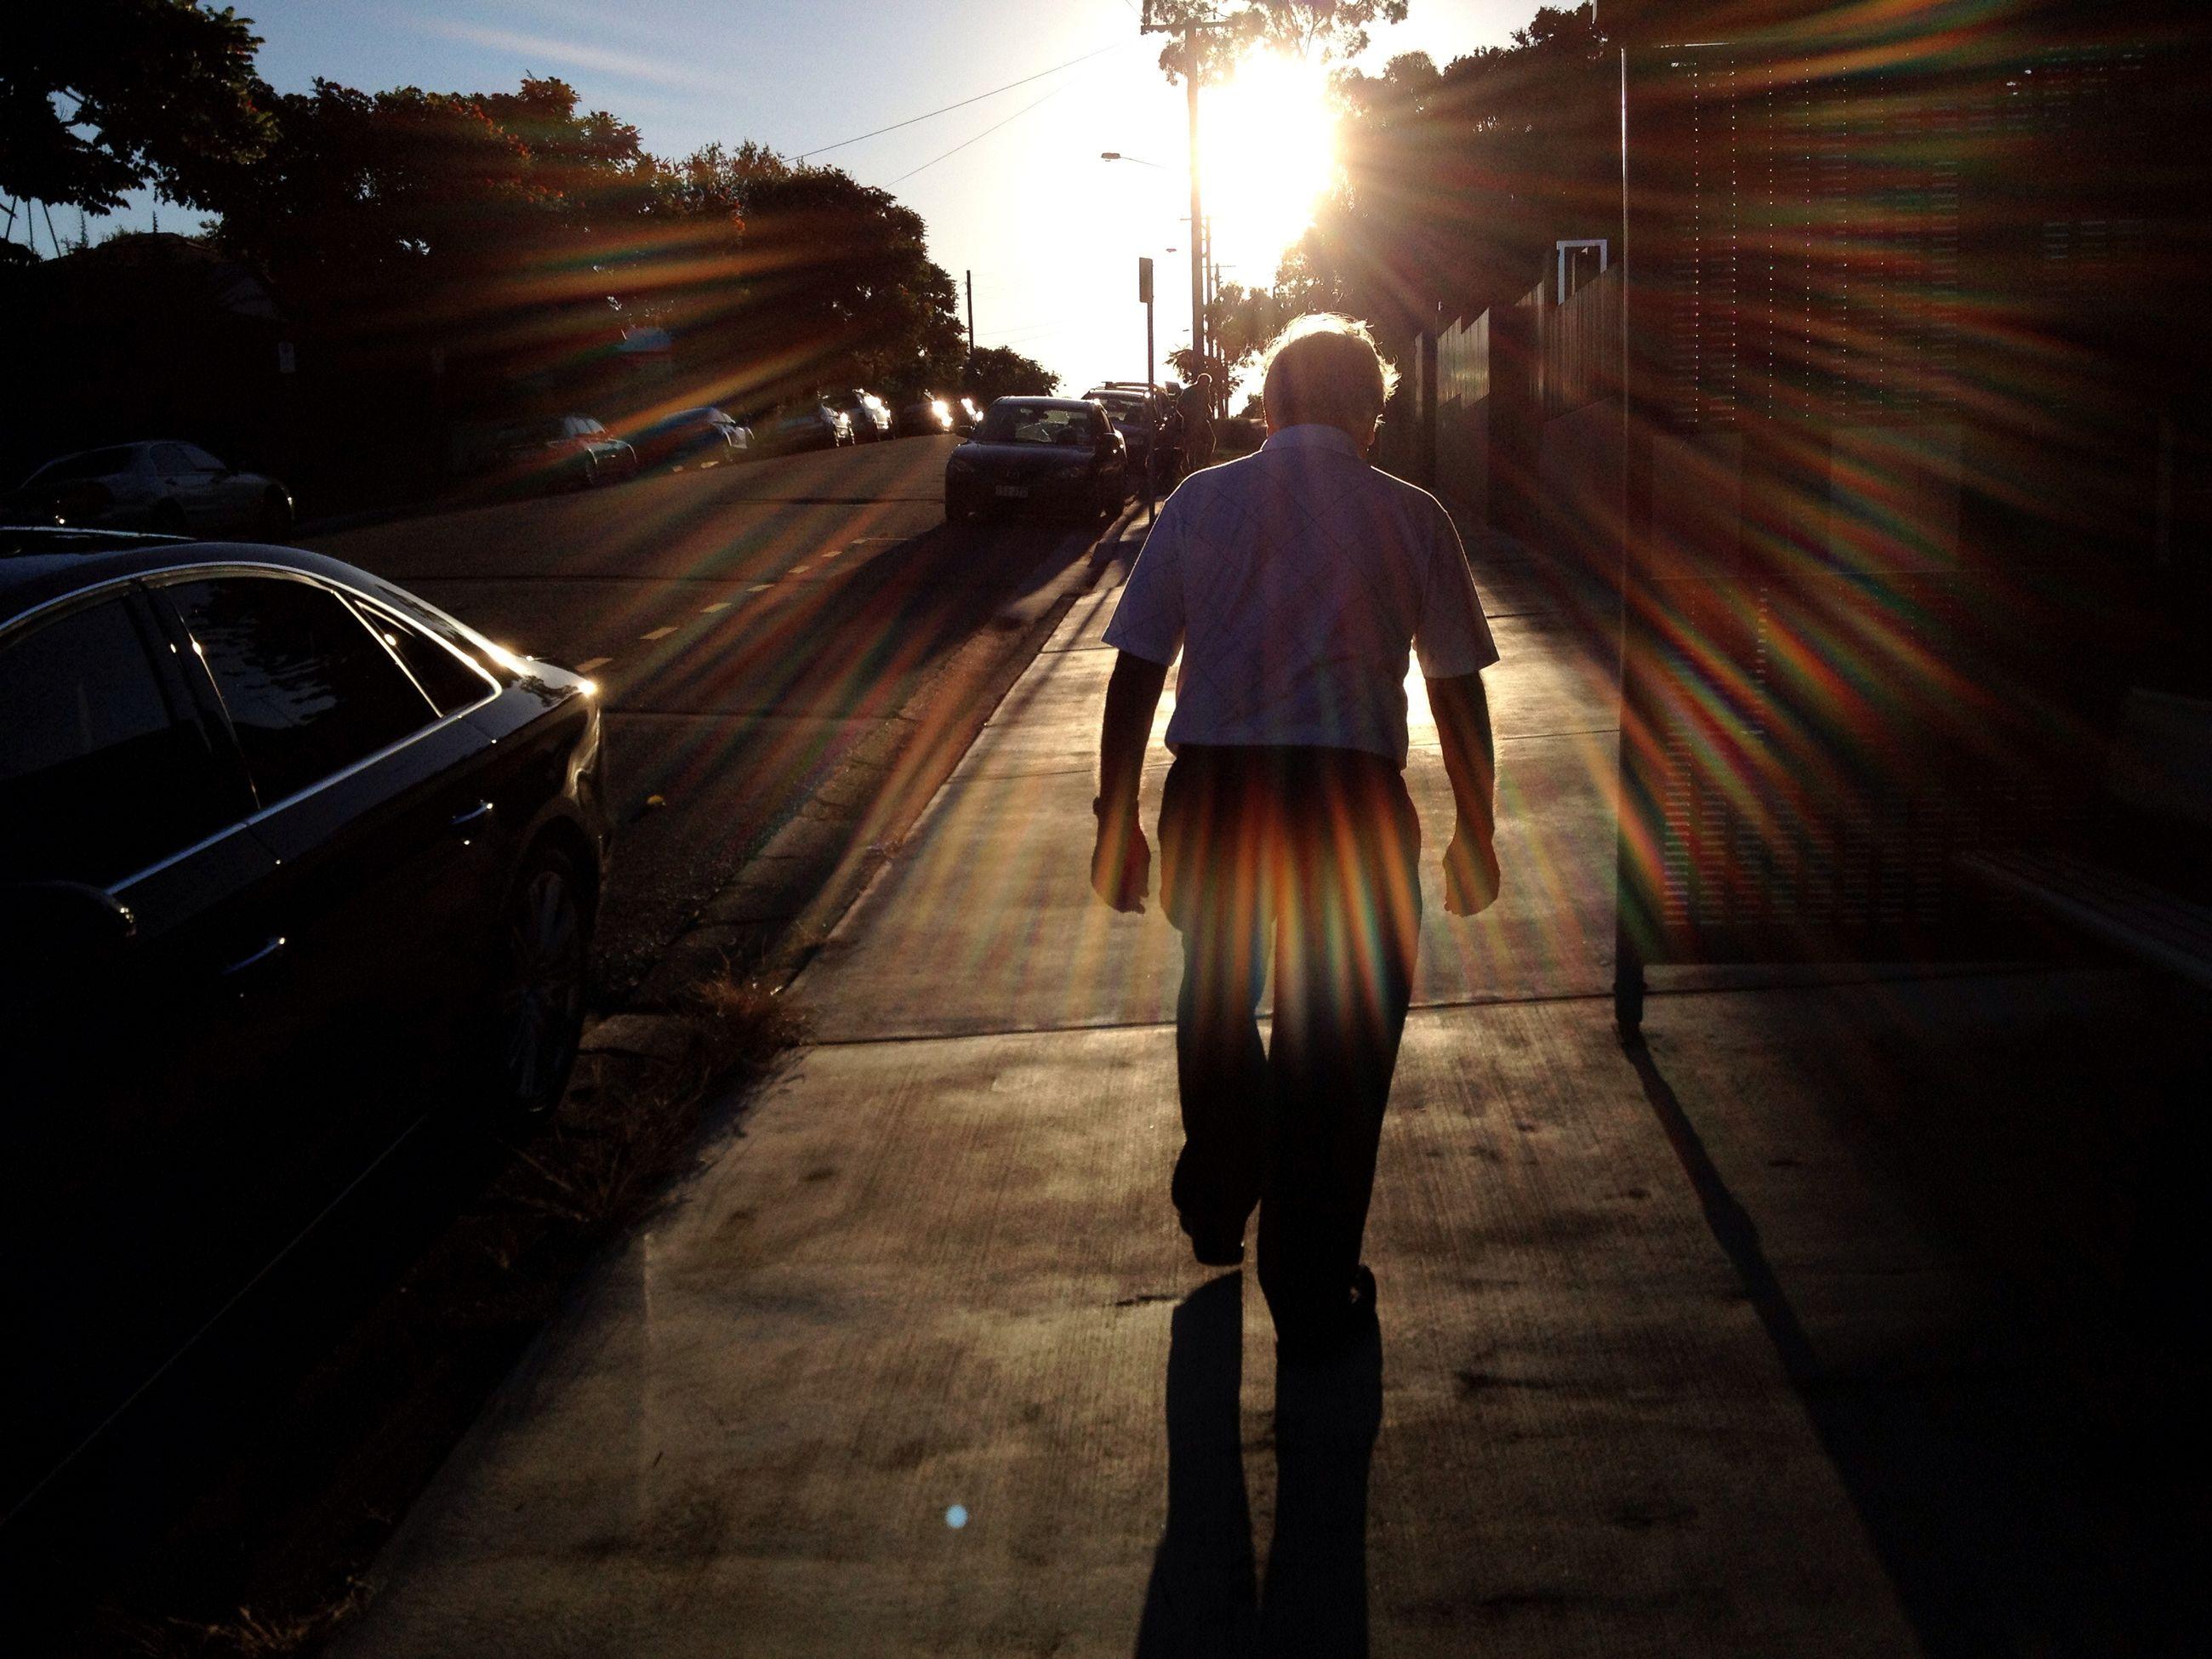 transportation, lifestyles, street, full length, sunlight, rear view, walking, shadow, men, leisure activity, road, sunbeam, the way forward, sun, on the move, mode of transport, car, land vehicle